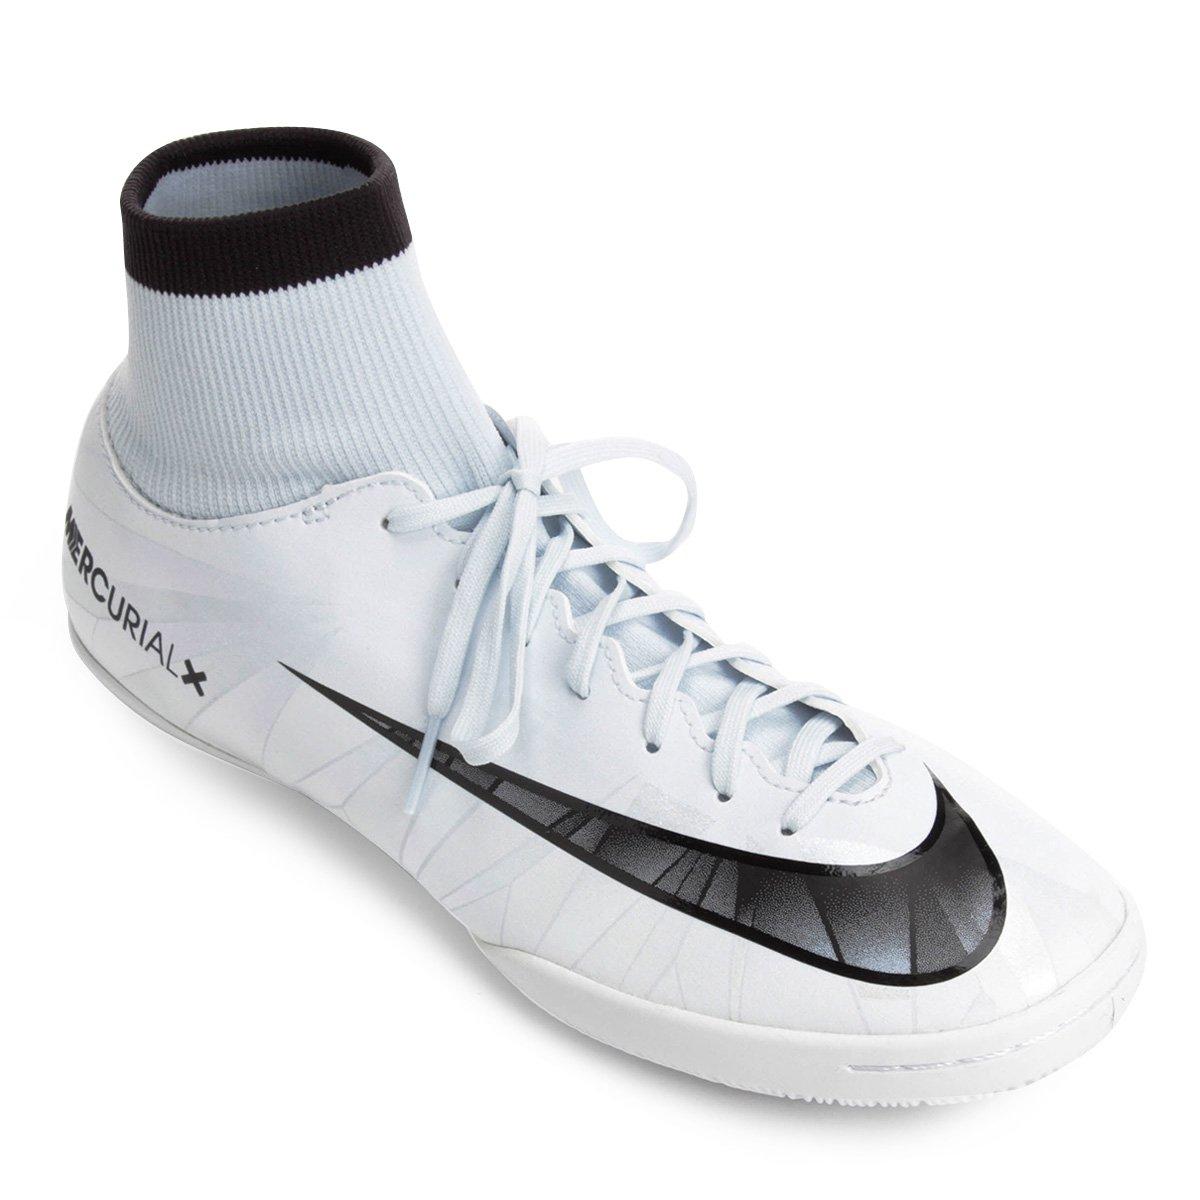 33aa152b03b5c Chuteira Futsal Nike Mercurial X Victory 6 CR7 DF IC - Compre Agora ...